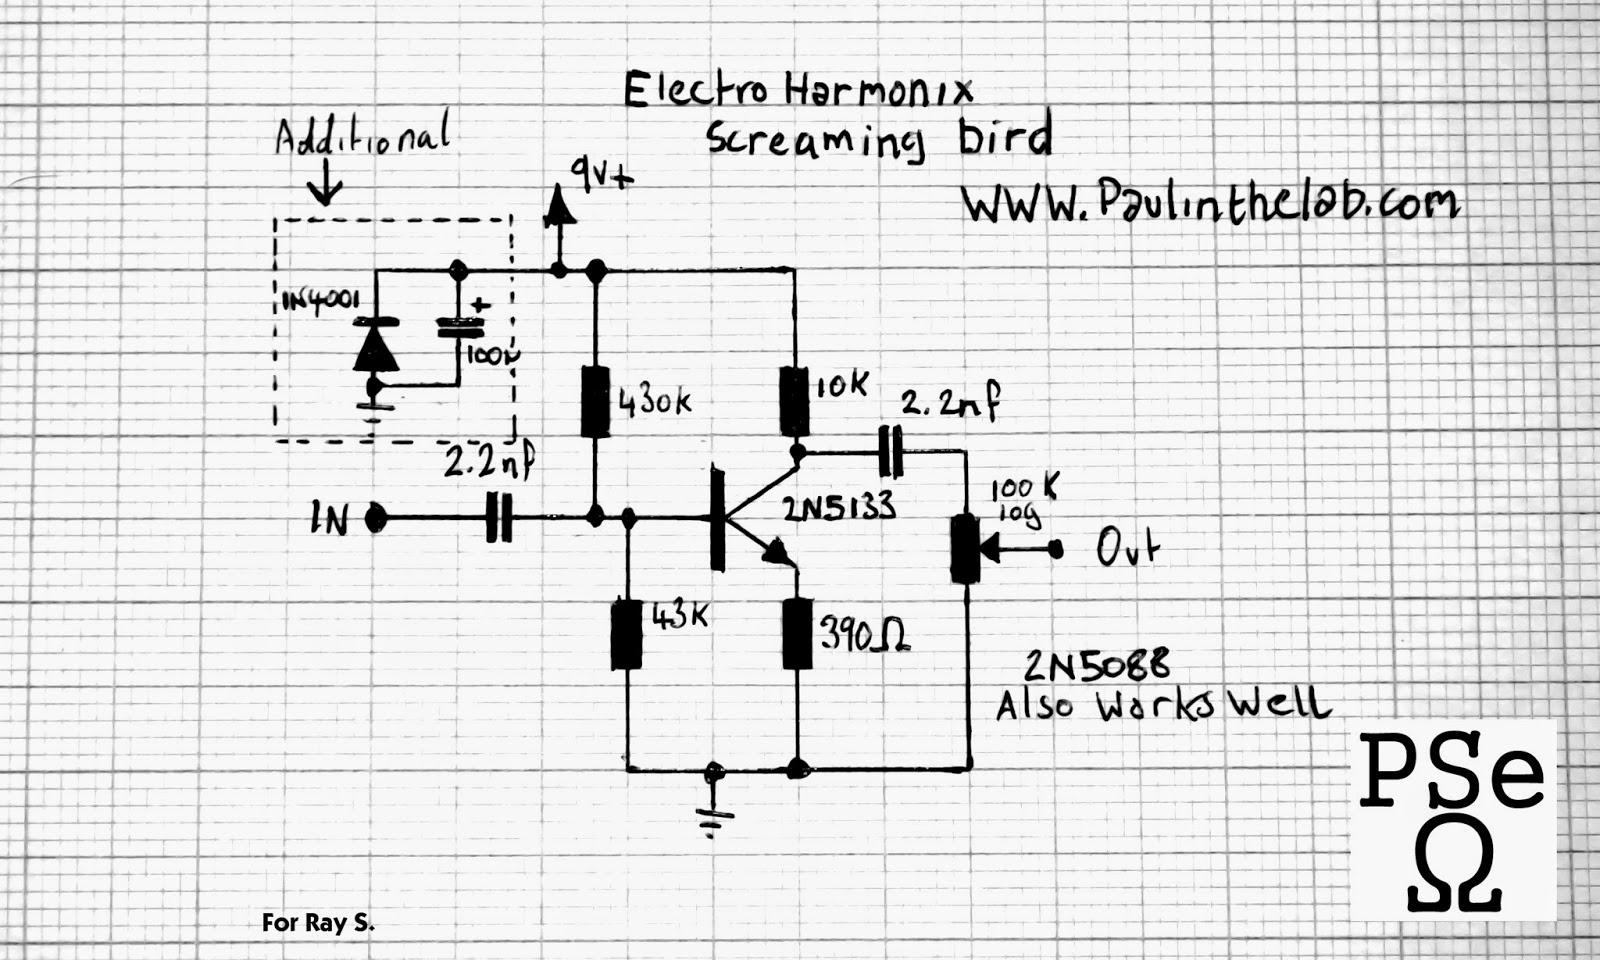 paul in the lab electro harmonix screaming bird treble booster stripboard veroboard layout. Black Bedroom Furniture Sets. Home Design Ideas